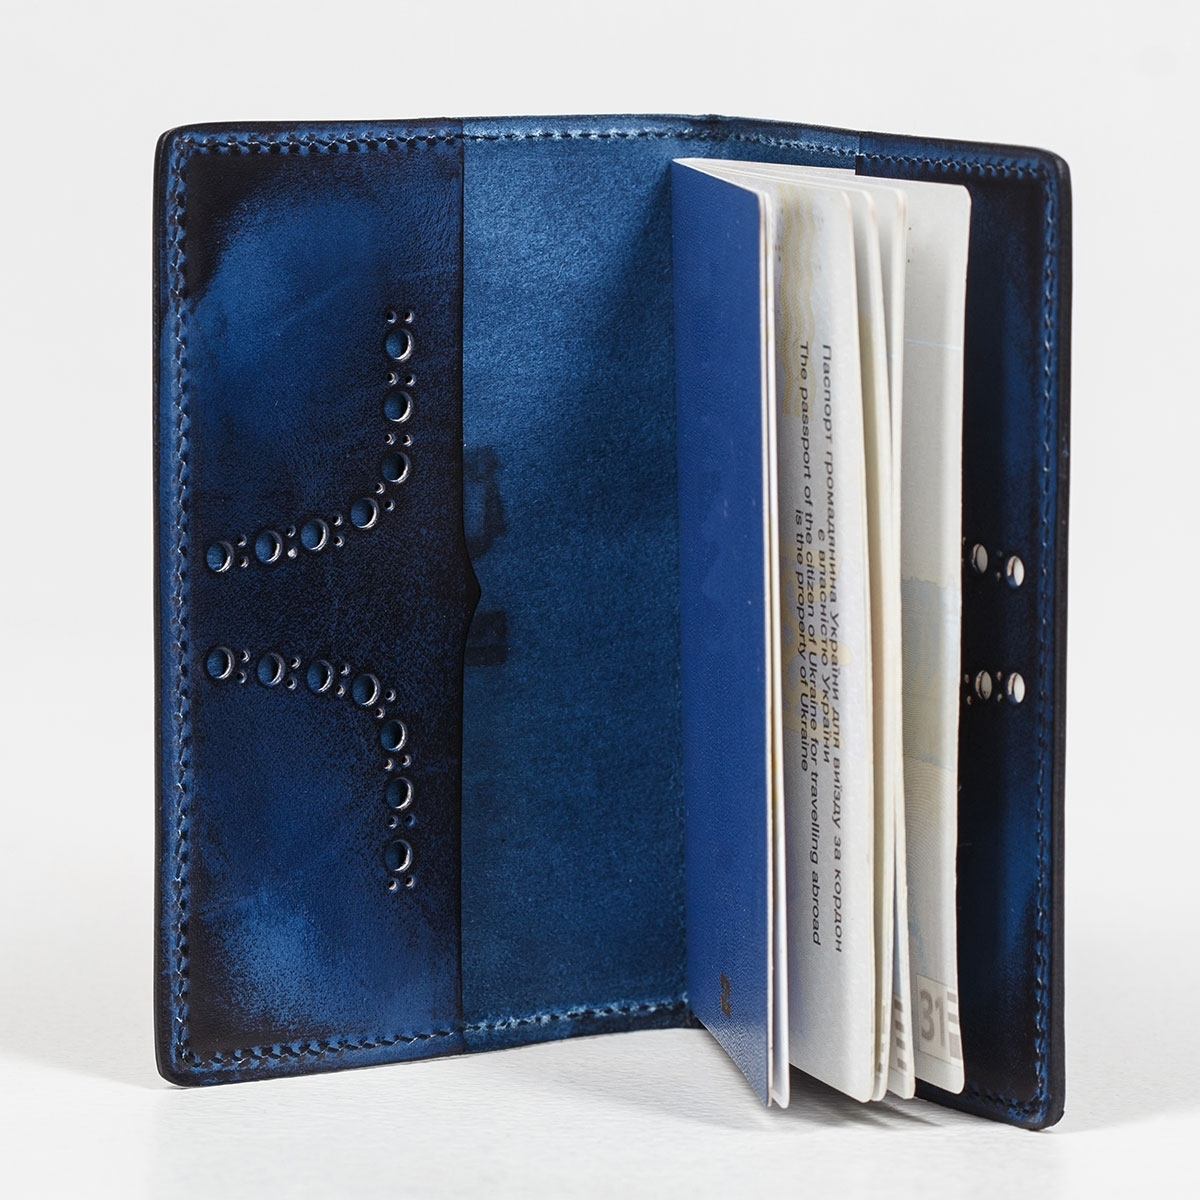 Passport cover CYNARA grassy green & sapphire blue